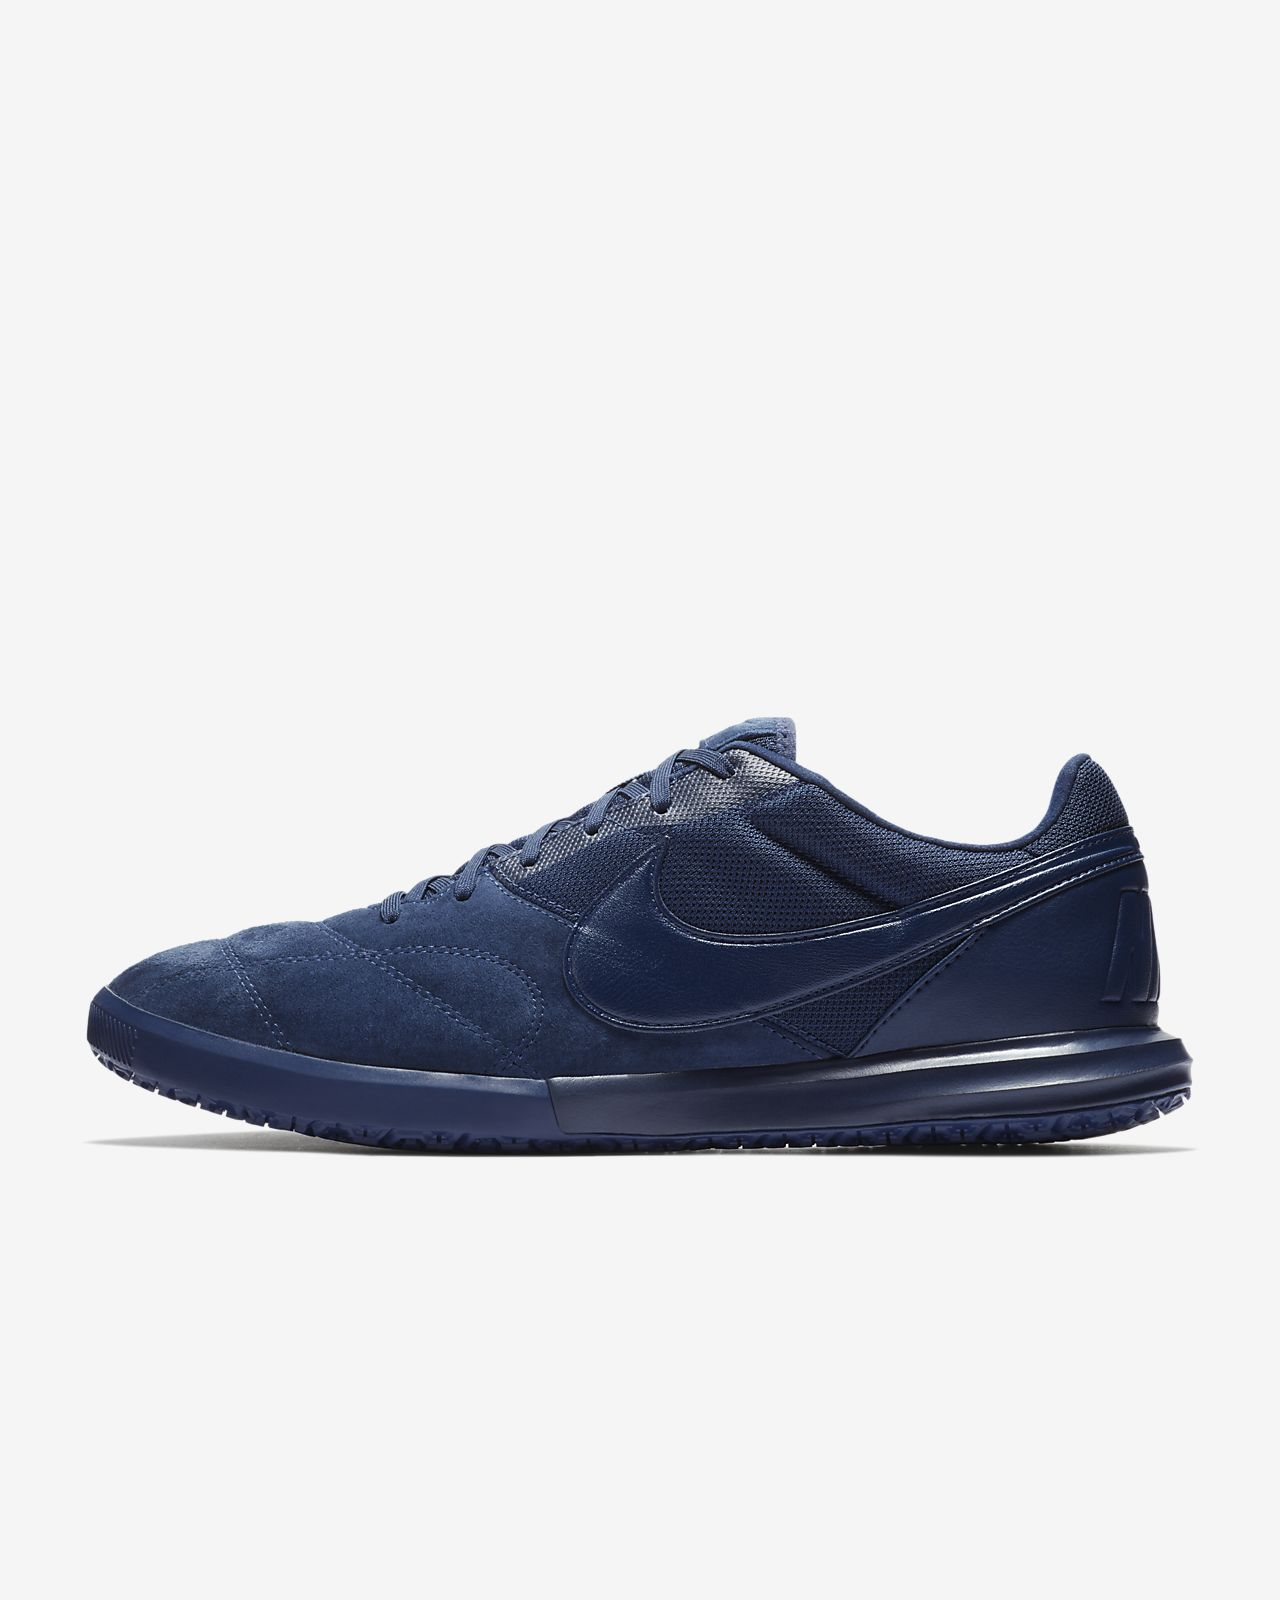 ... Scarpa da calcio per campo indoor cemento Nike Tiempo Premier II Sala db26b78ea95